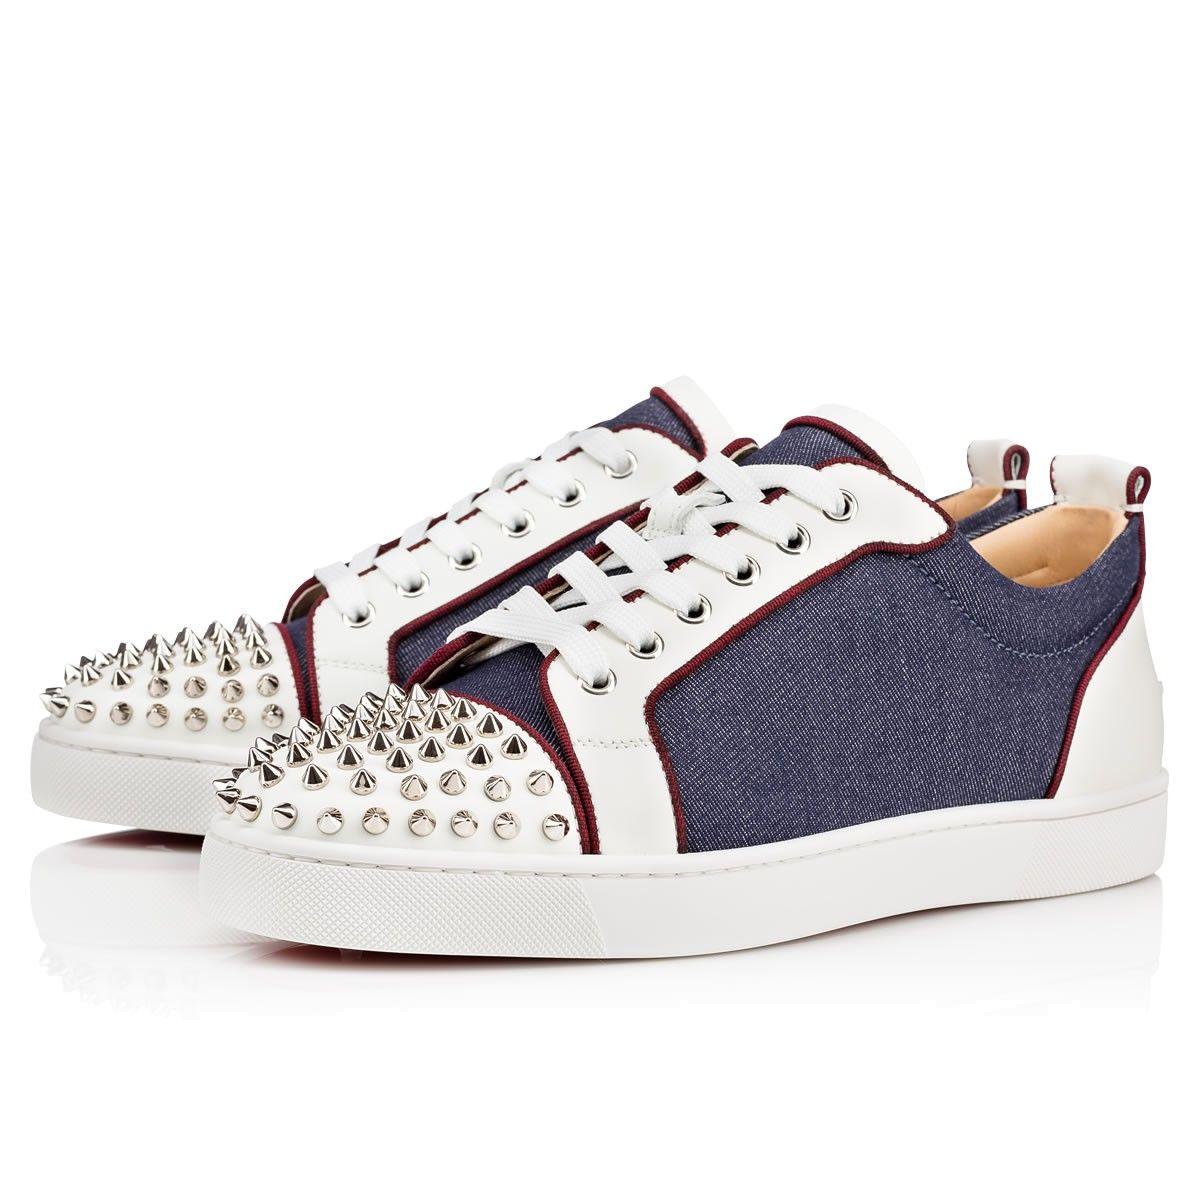 8ca932f57d80 CHRISTIAN LOUBOUTIN Louis Junior Spikes Orlato Men s Flat Version  Blue Silver Leather - Men Shoes - Christian Louboutin.  christianlouboutin   shoes